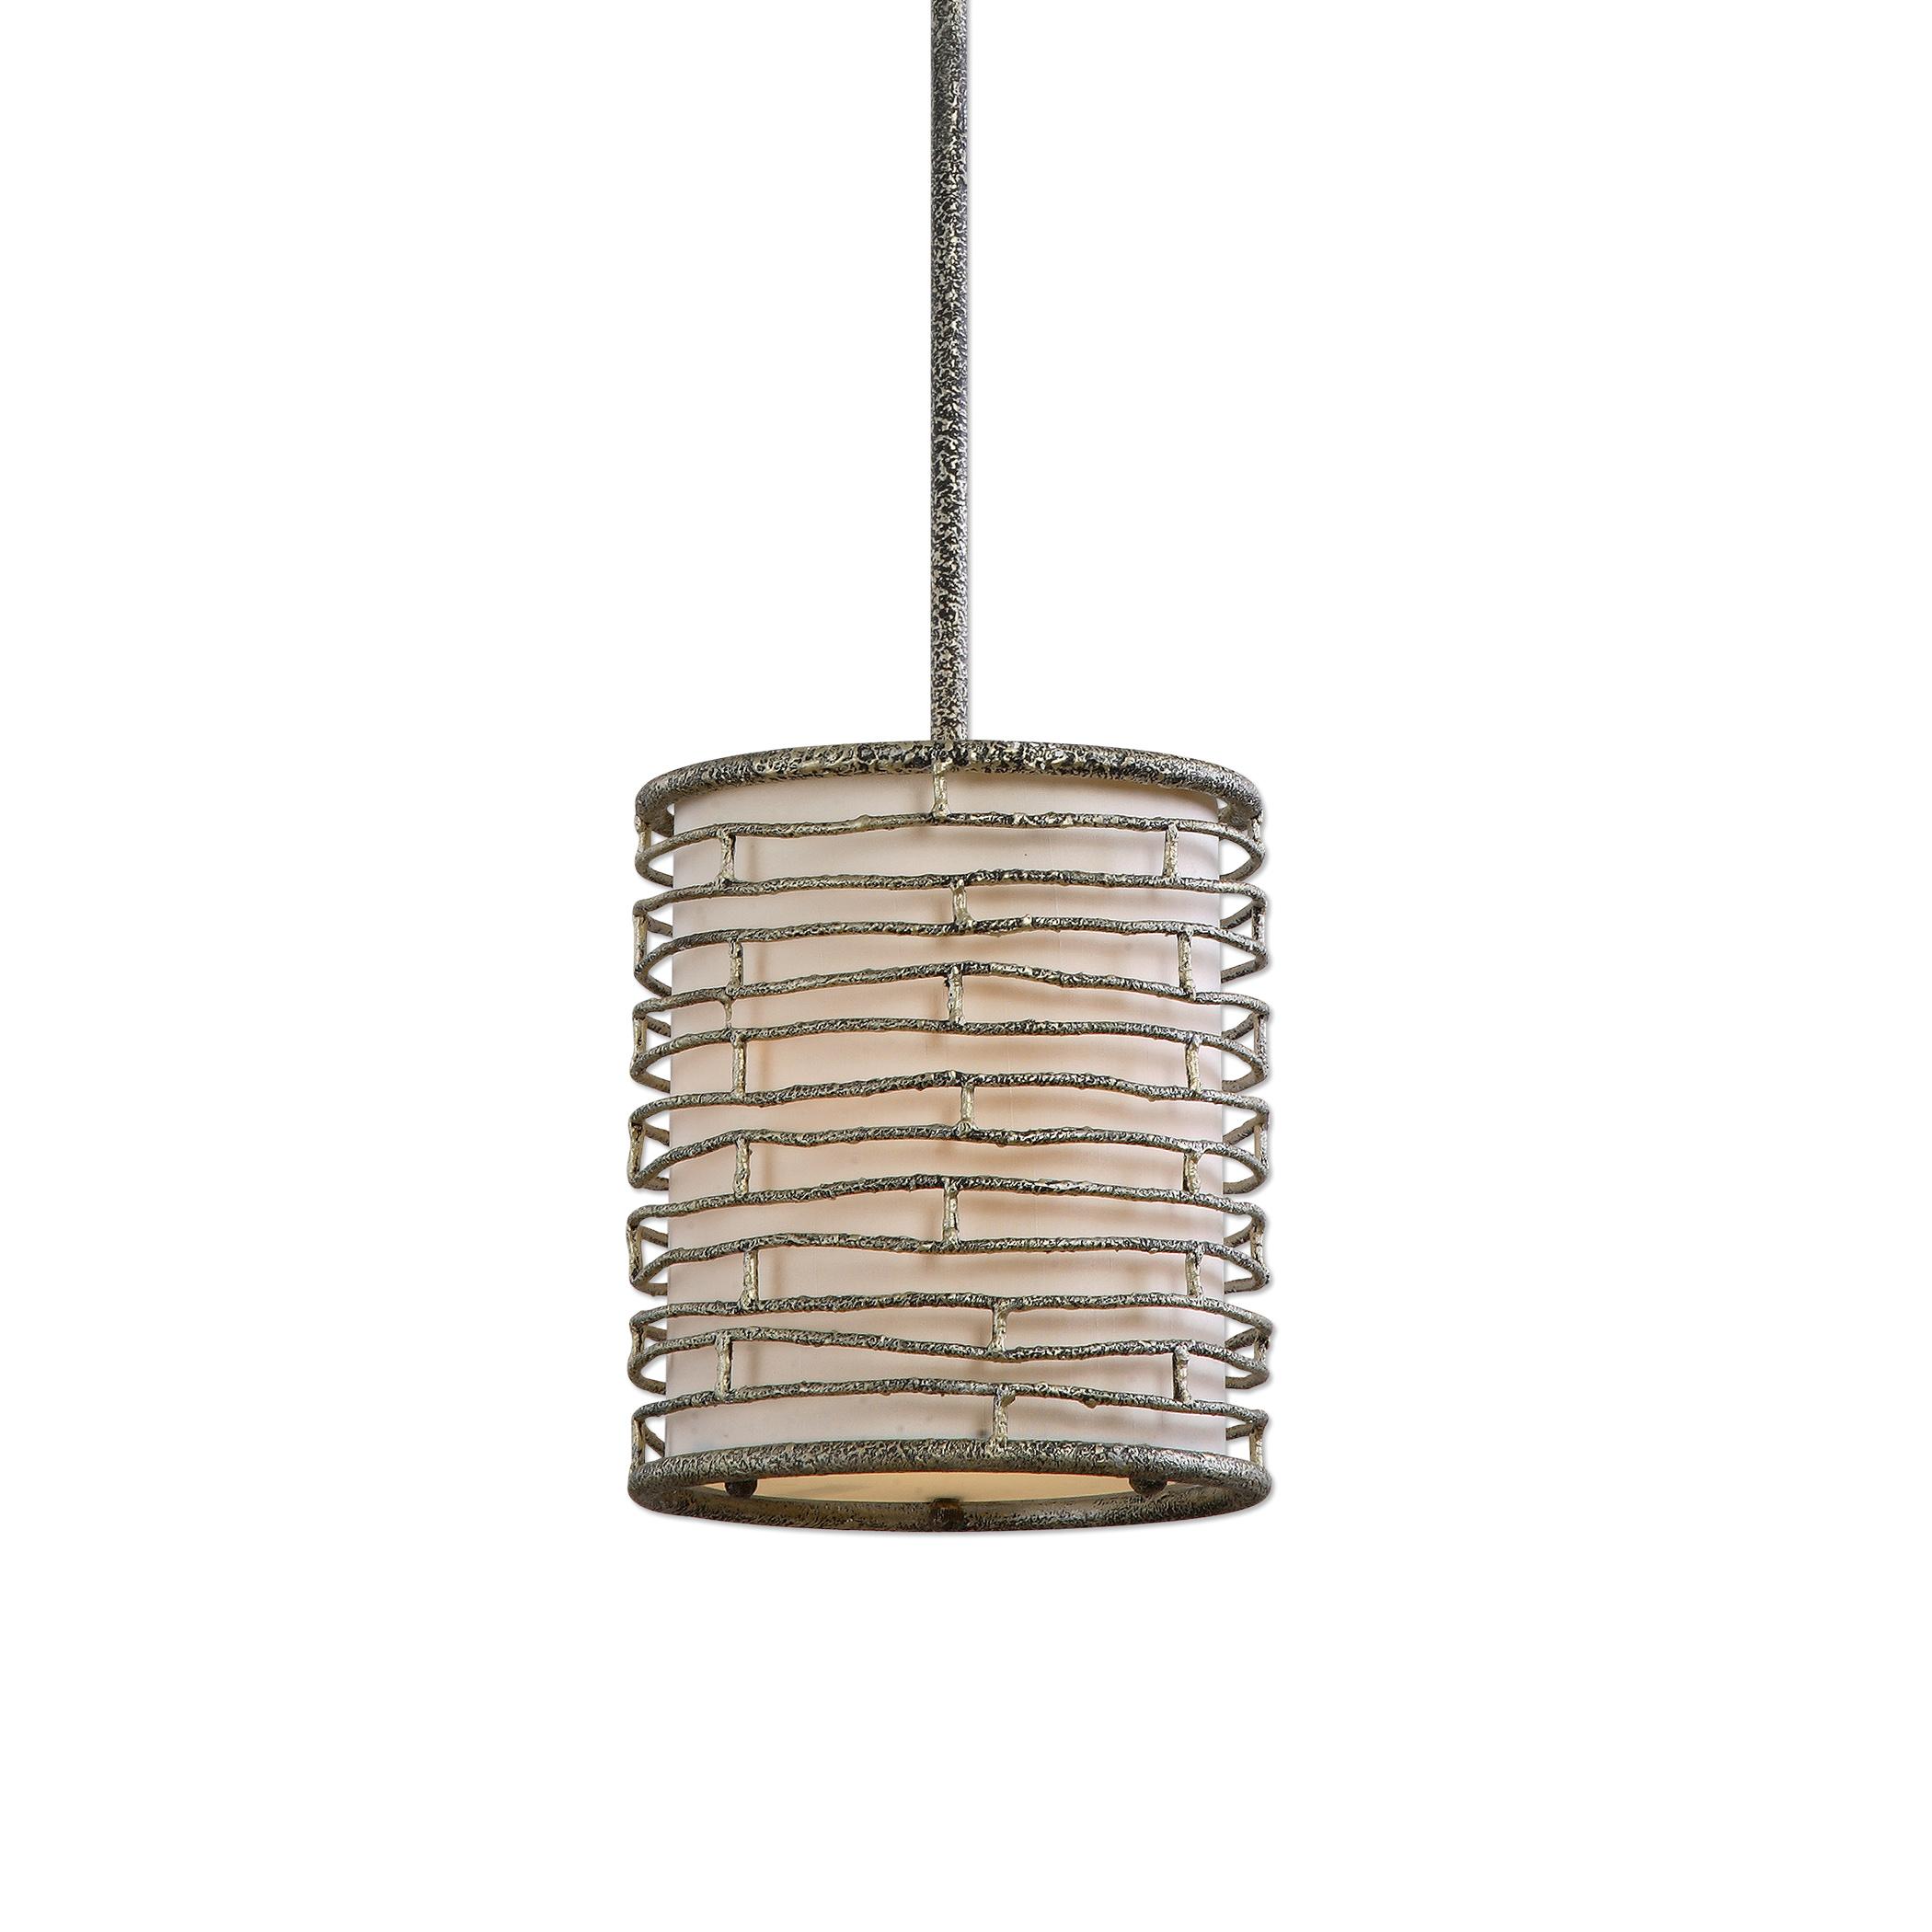 Uttermost Lighting Fixtures Smida 1 Light Rustic Mini Pendant - Item Number: 22072